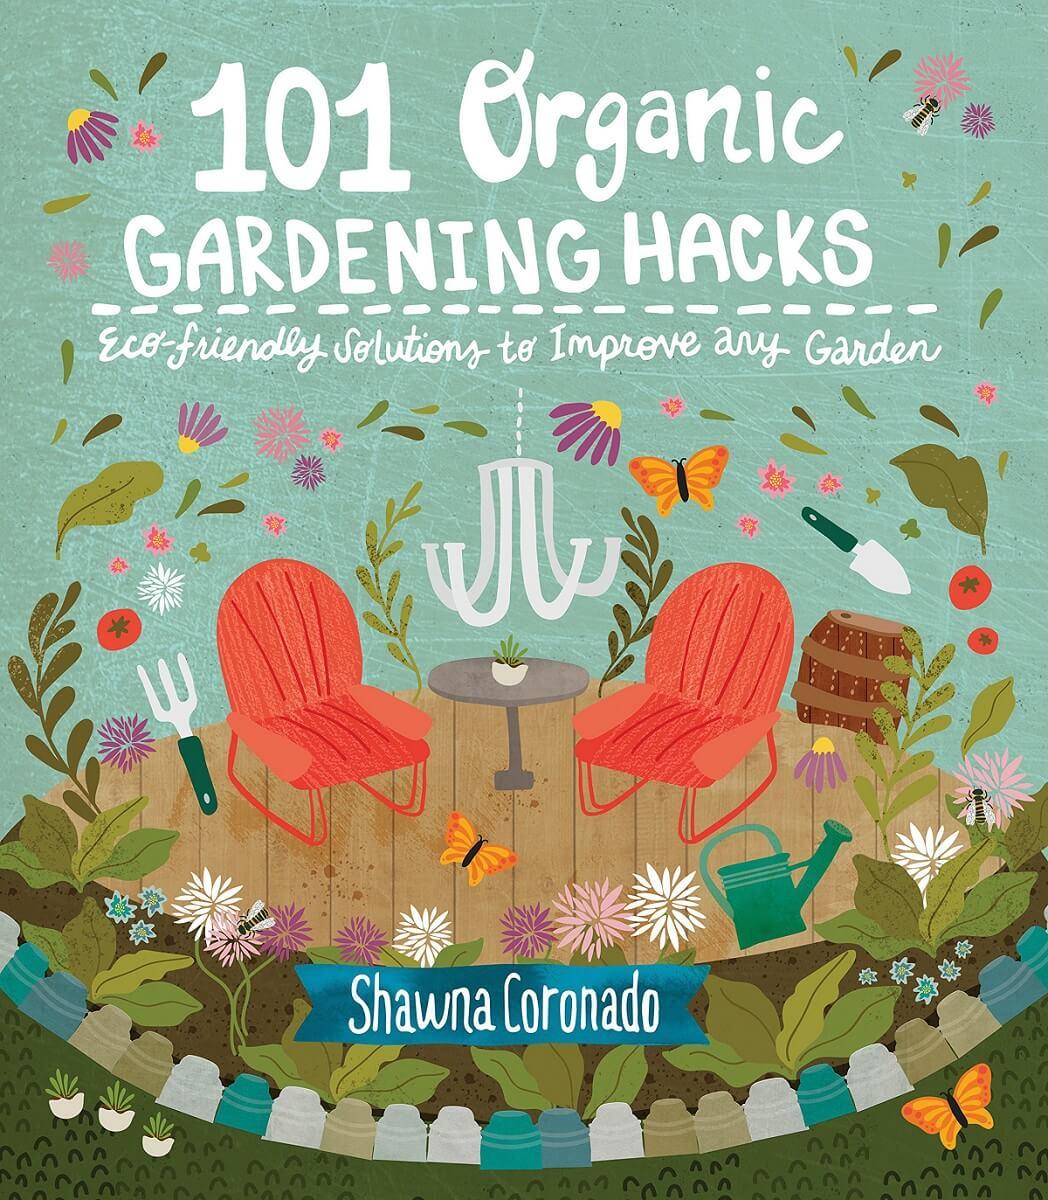 101 organic gardening hacks book